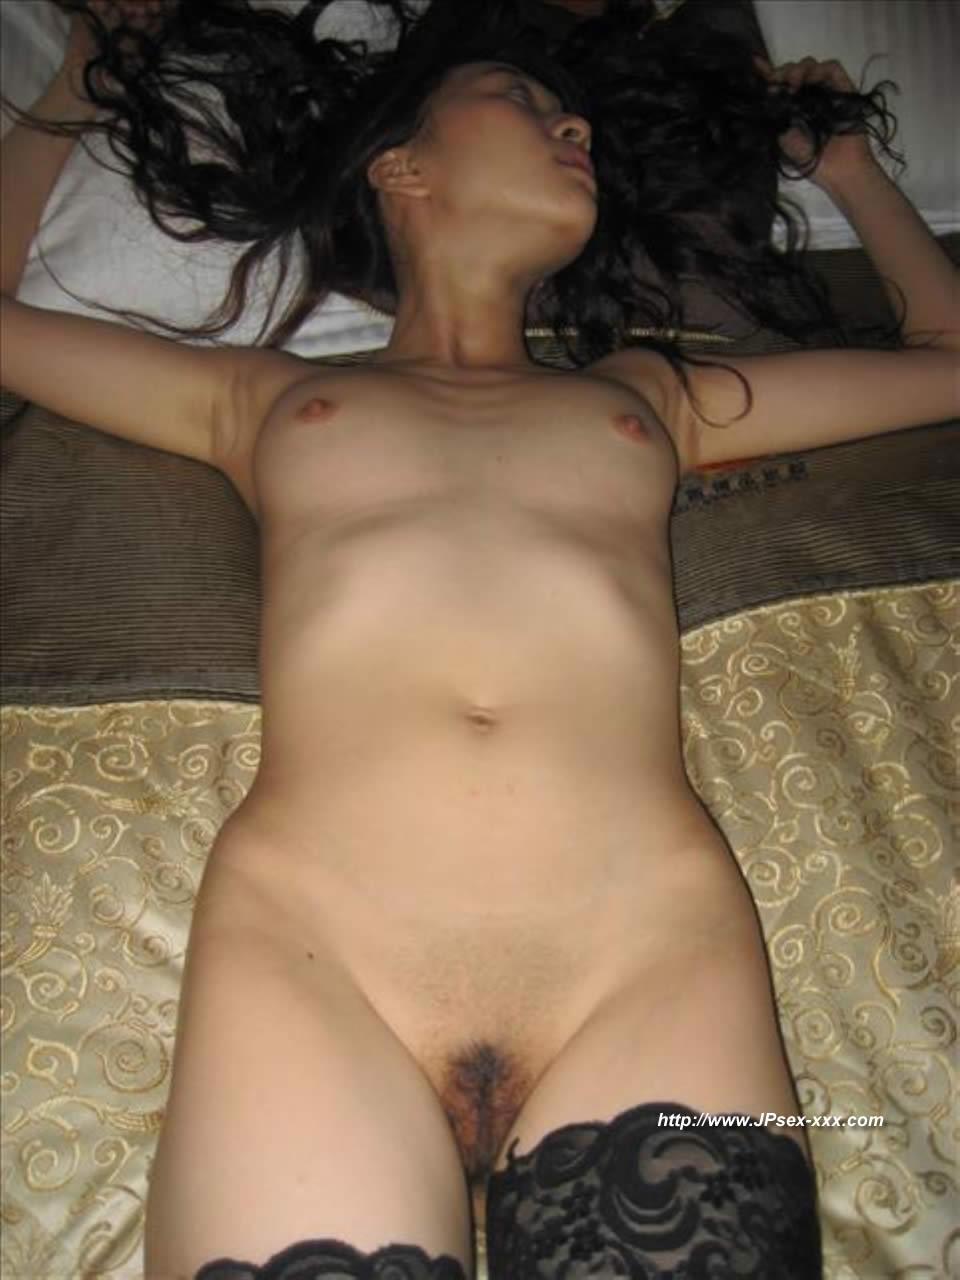 xxx video amateur wife Free